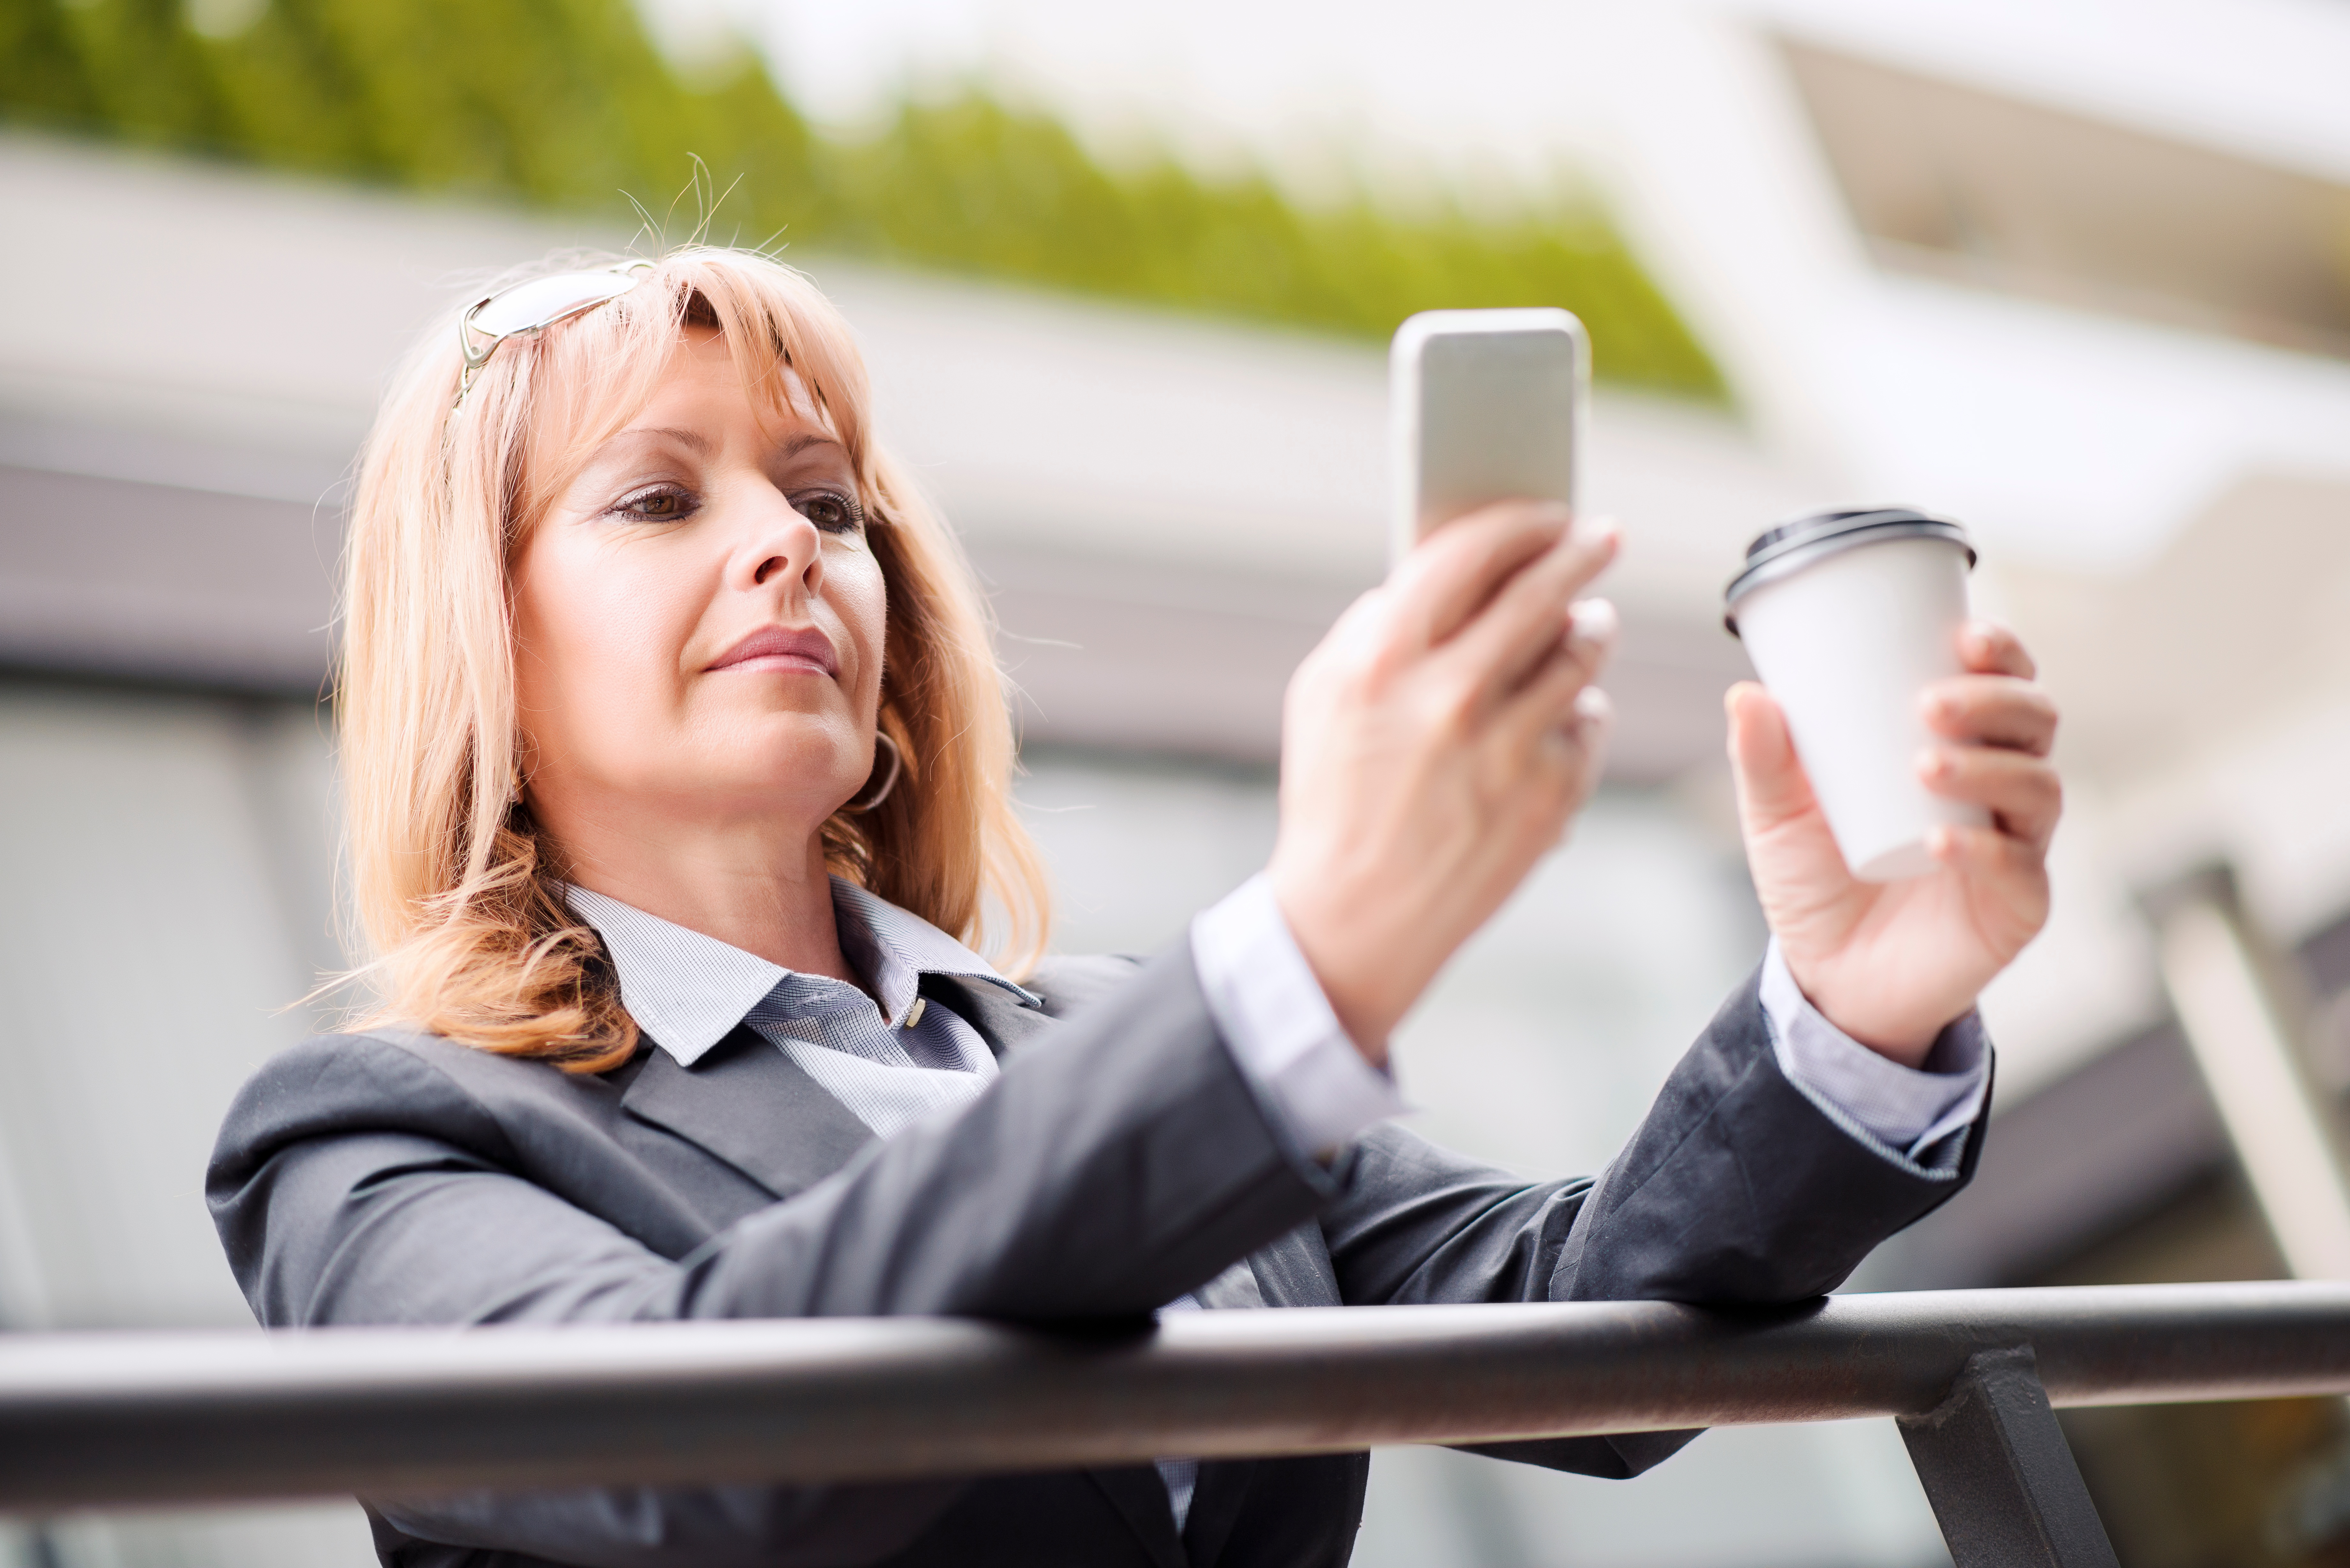 Smartphone: Staedy Companion